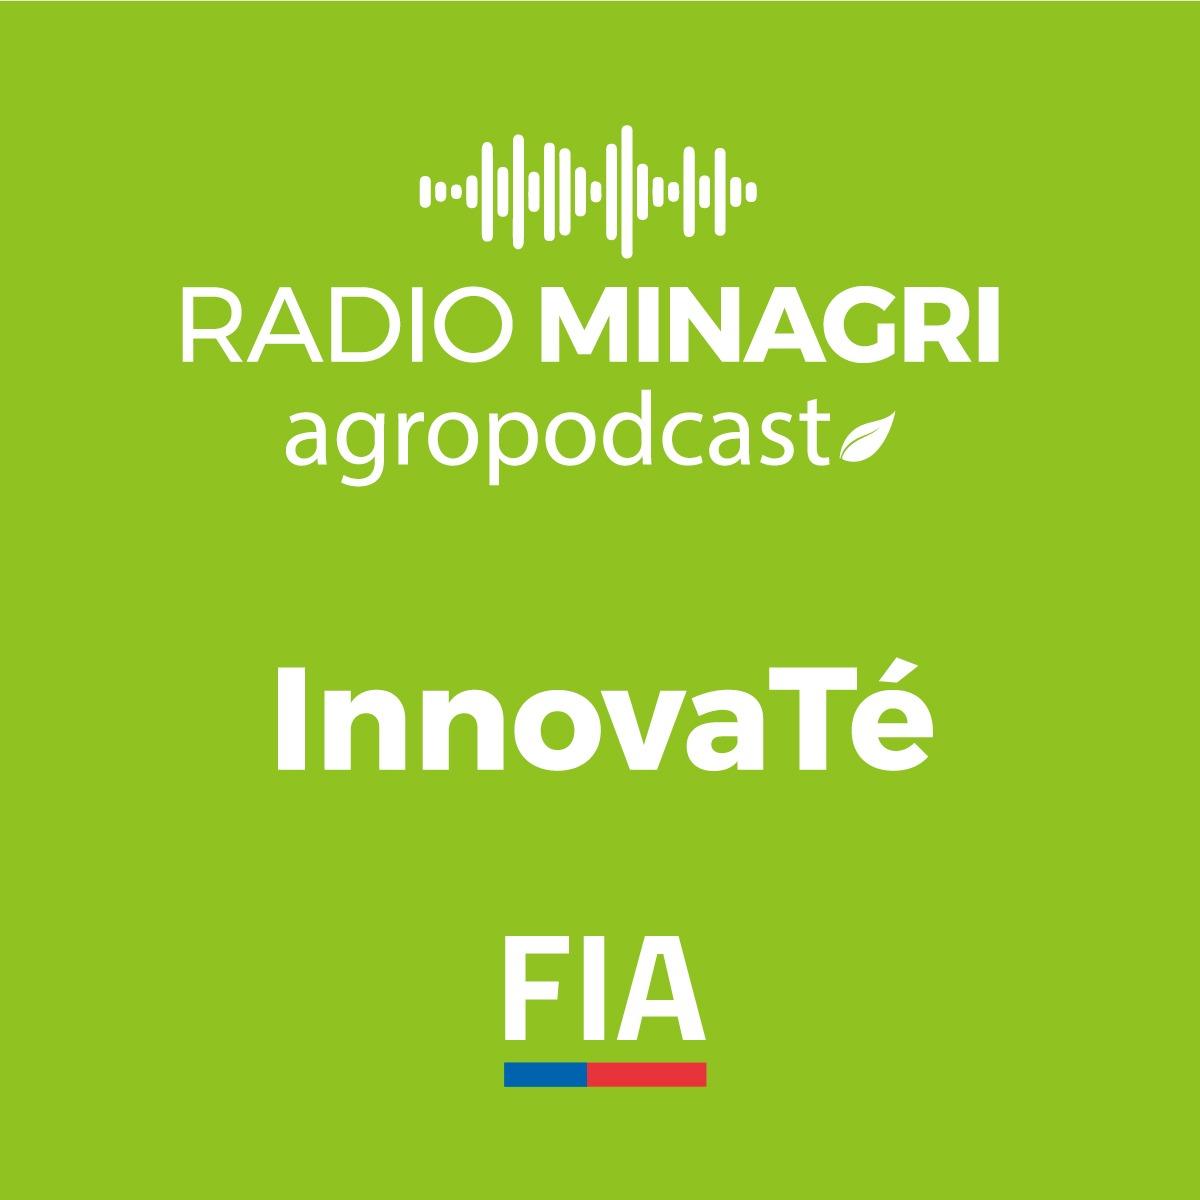 InnovaTé – Episodio 29: Cultivo de la papa del desierto